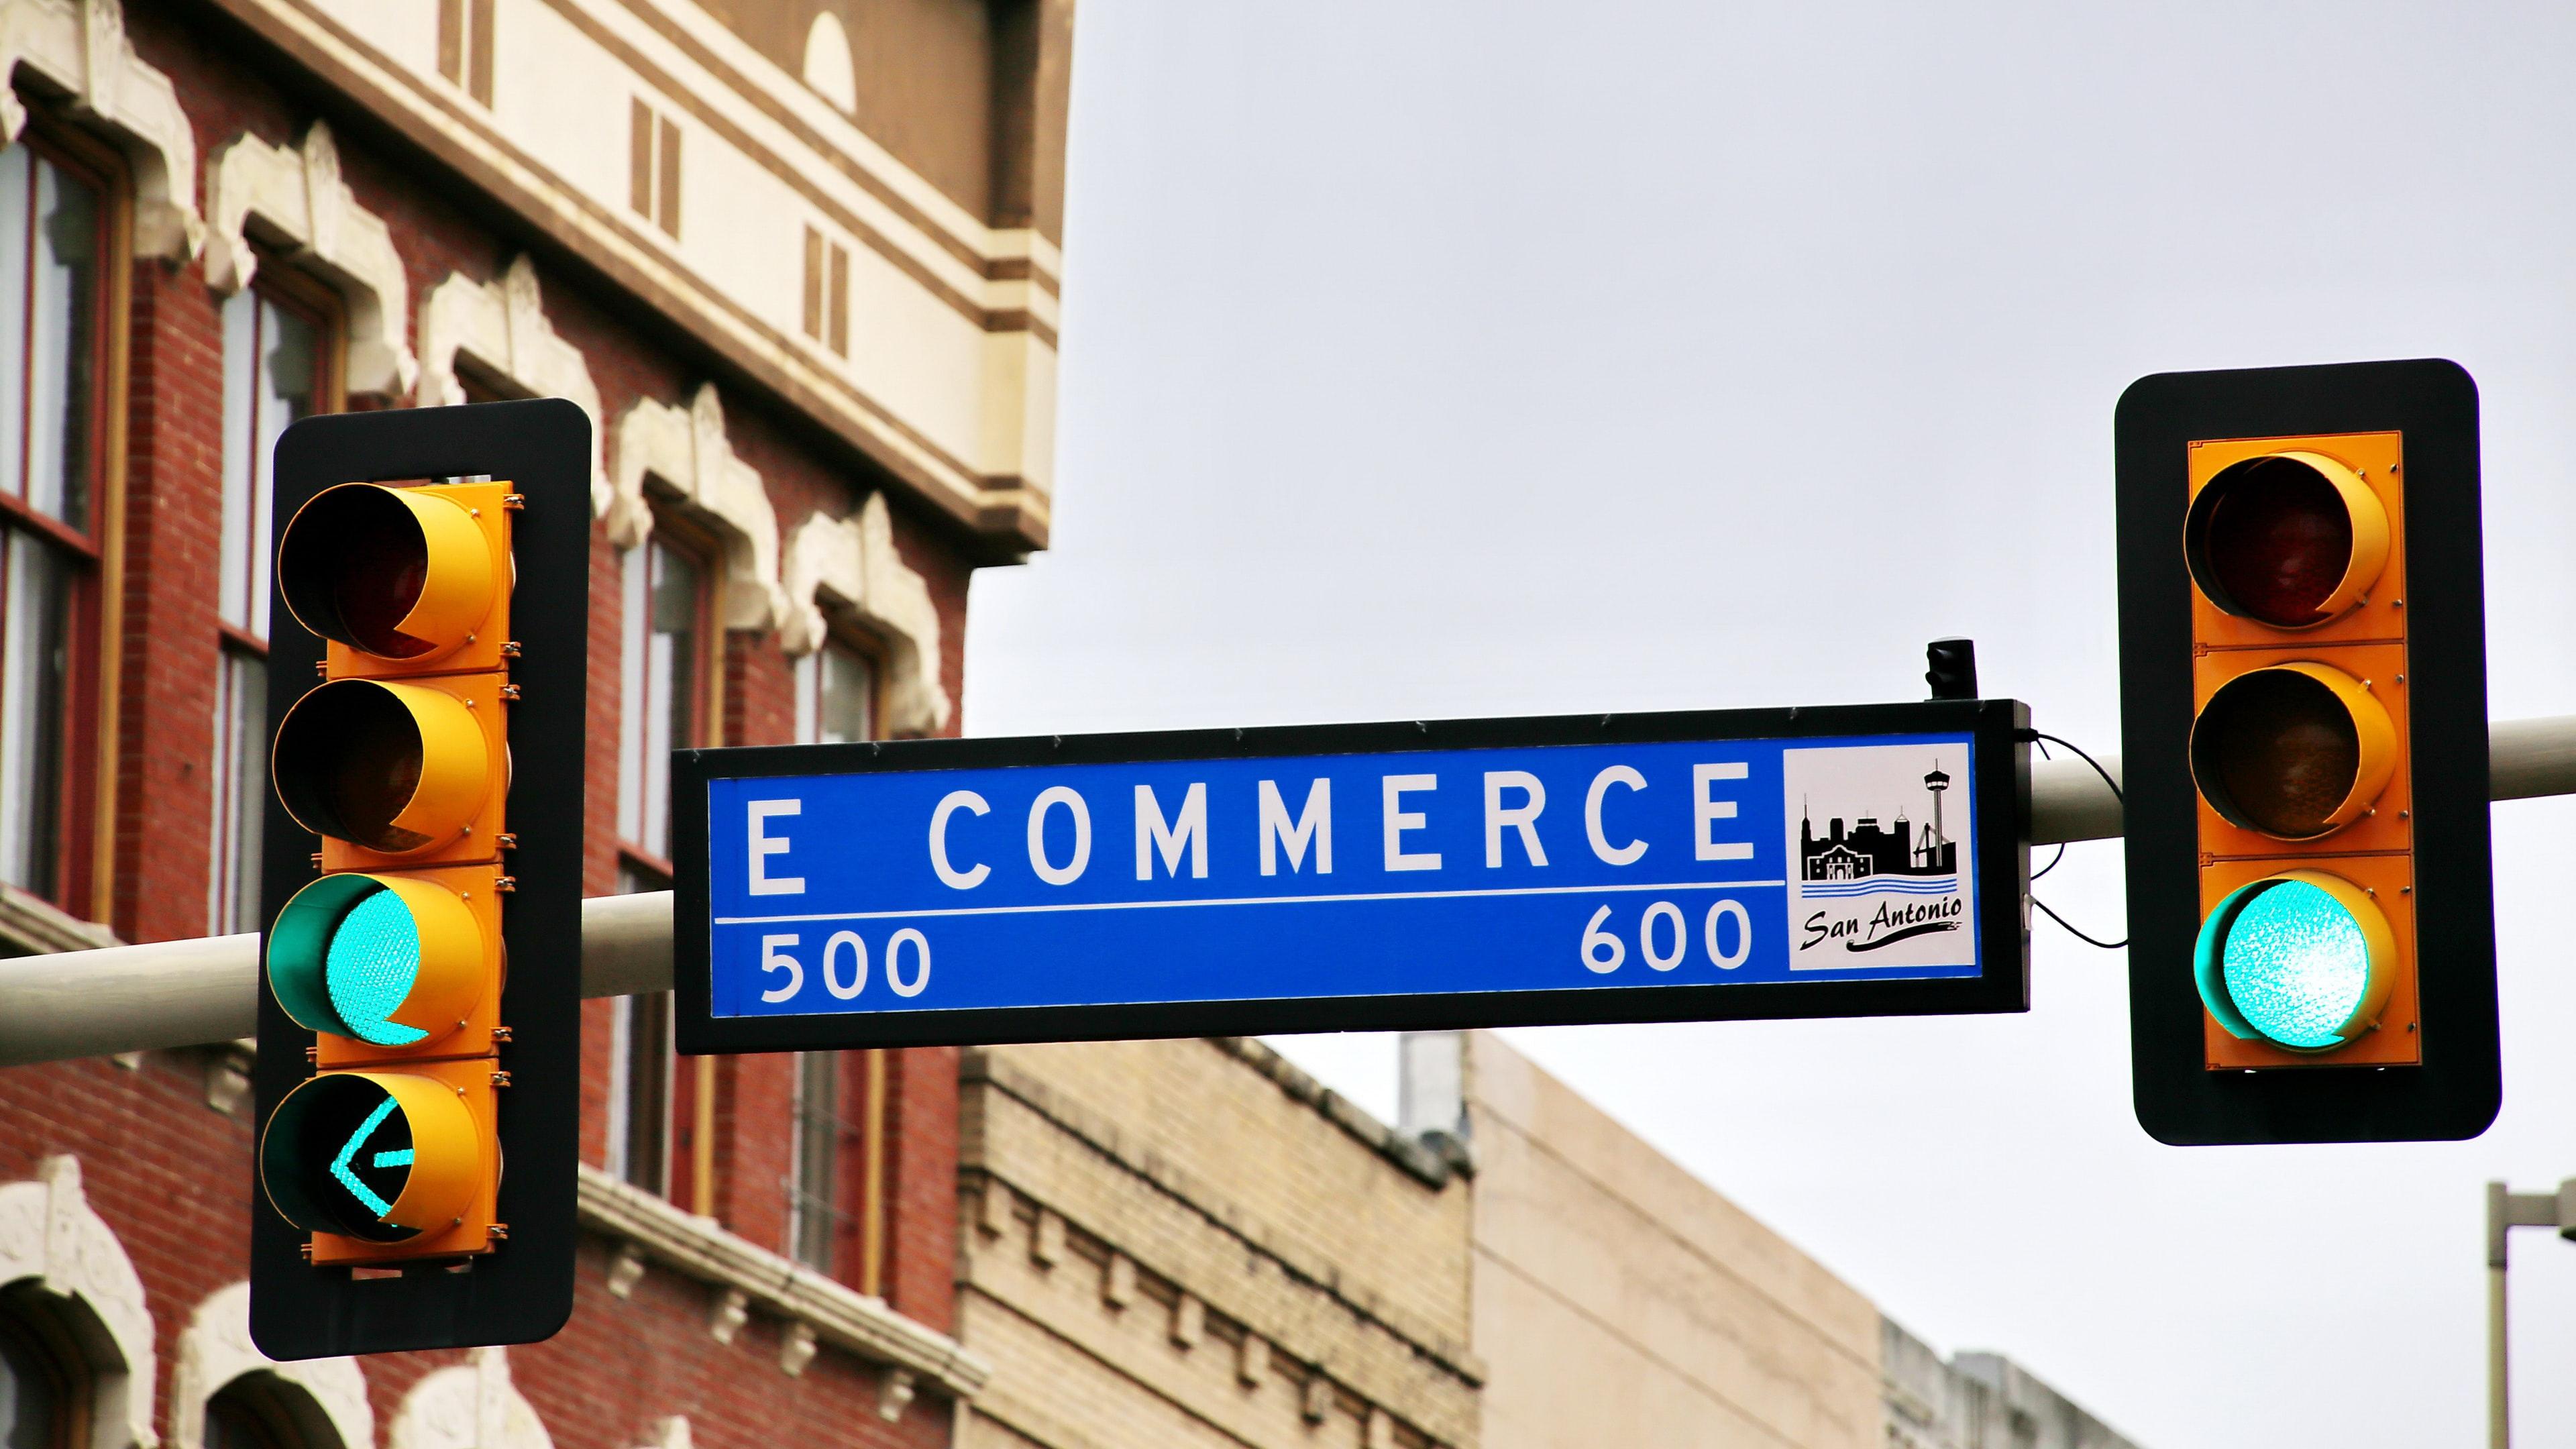 E-Commerce is Dead, Long Live A-Commerce